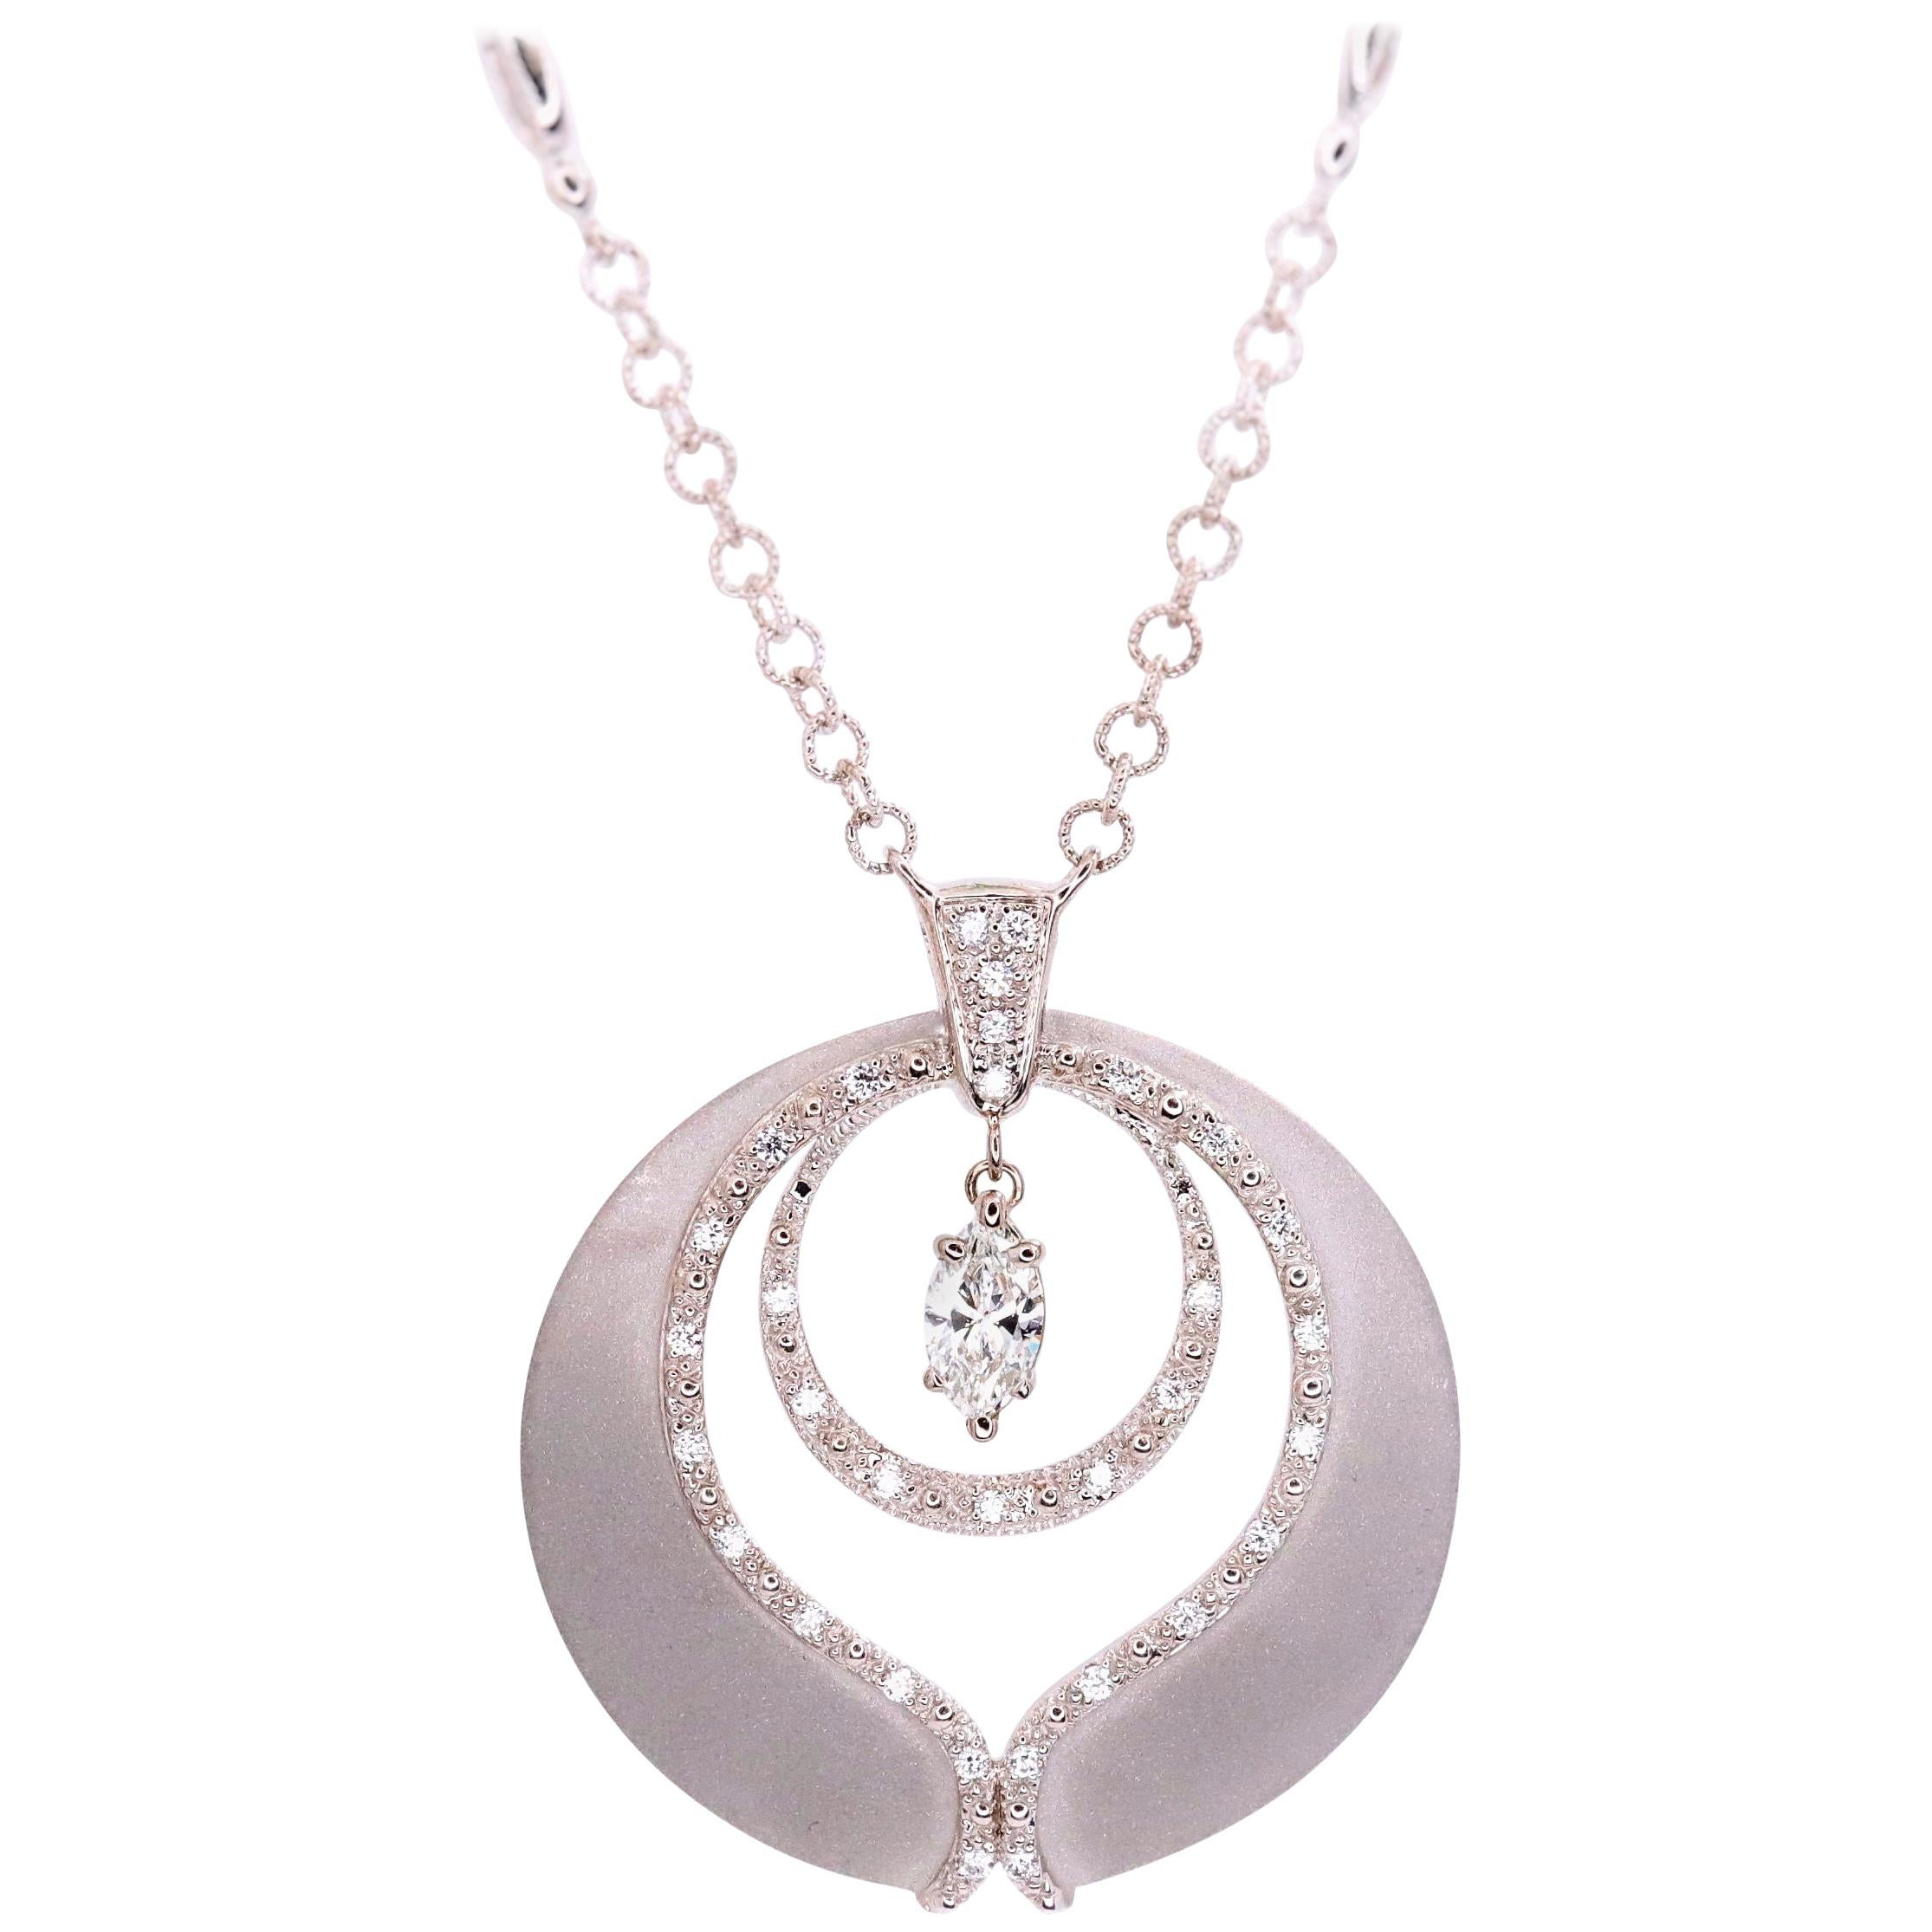 Phillipe Charriol Marquise Diamond Pendant Necklace in 18 Karat Gold 0.65 Carat